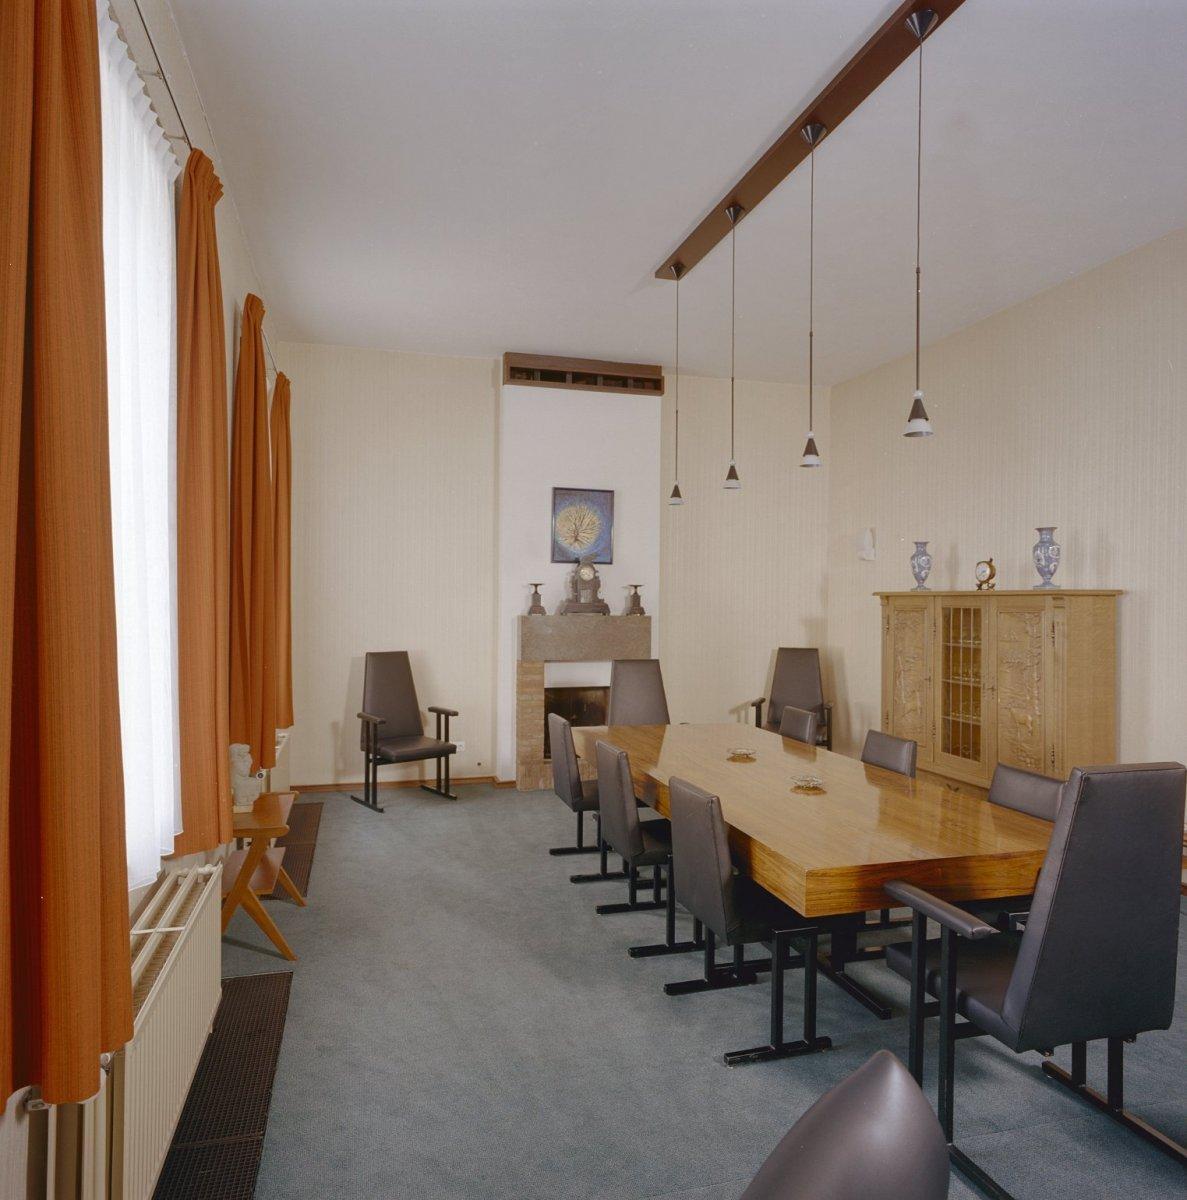 File:Interieur, overzicht raadzaal - Tilburg - 20351229 - RCE.jpg ...